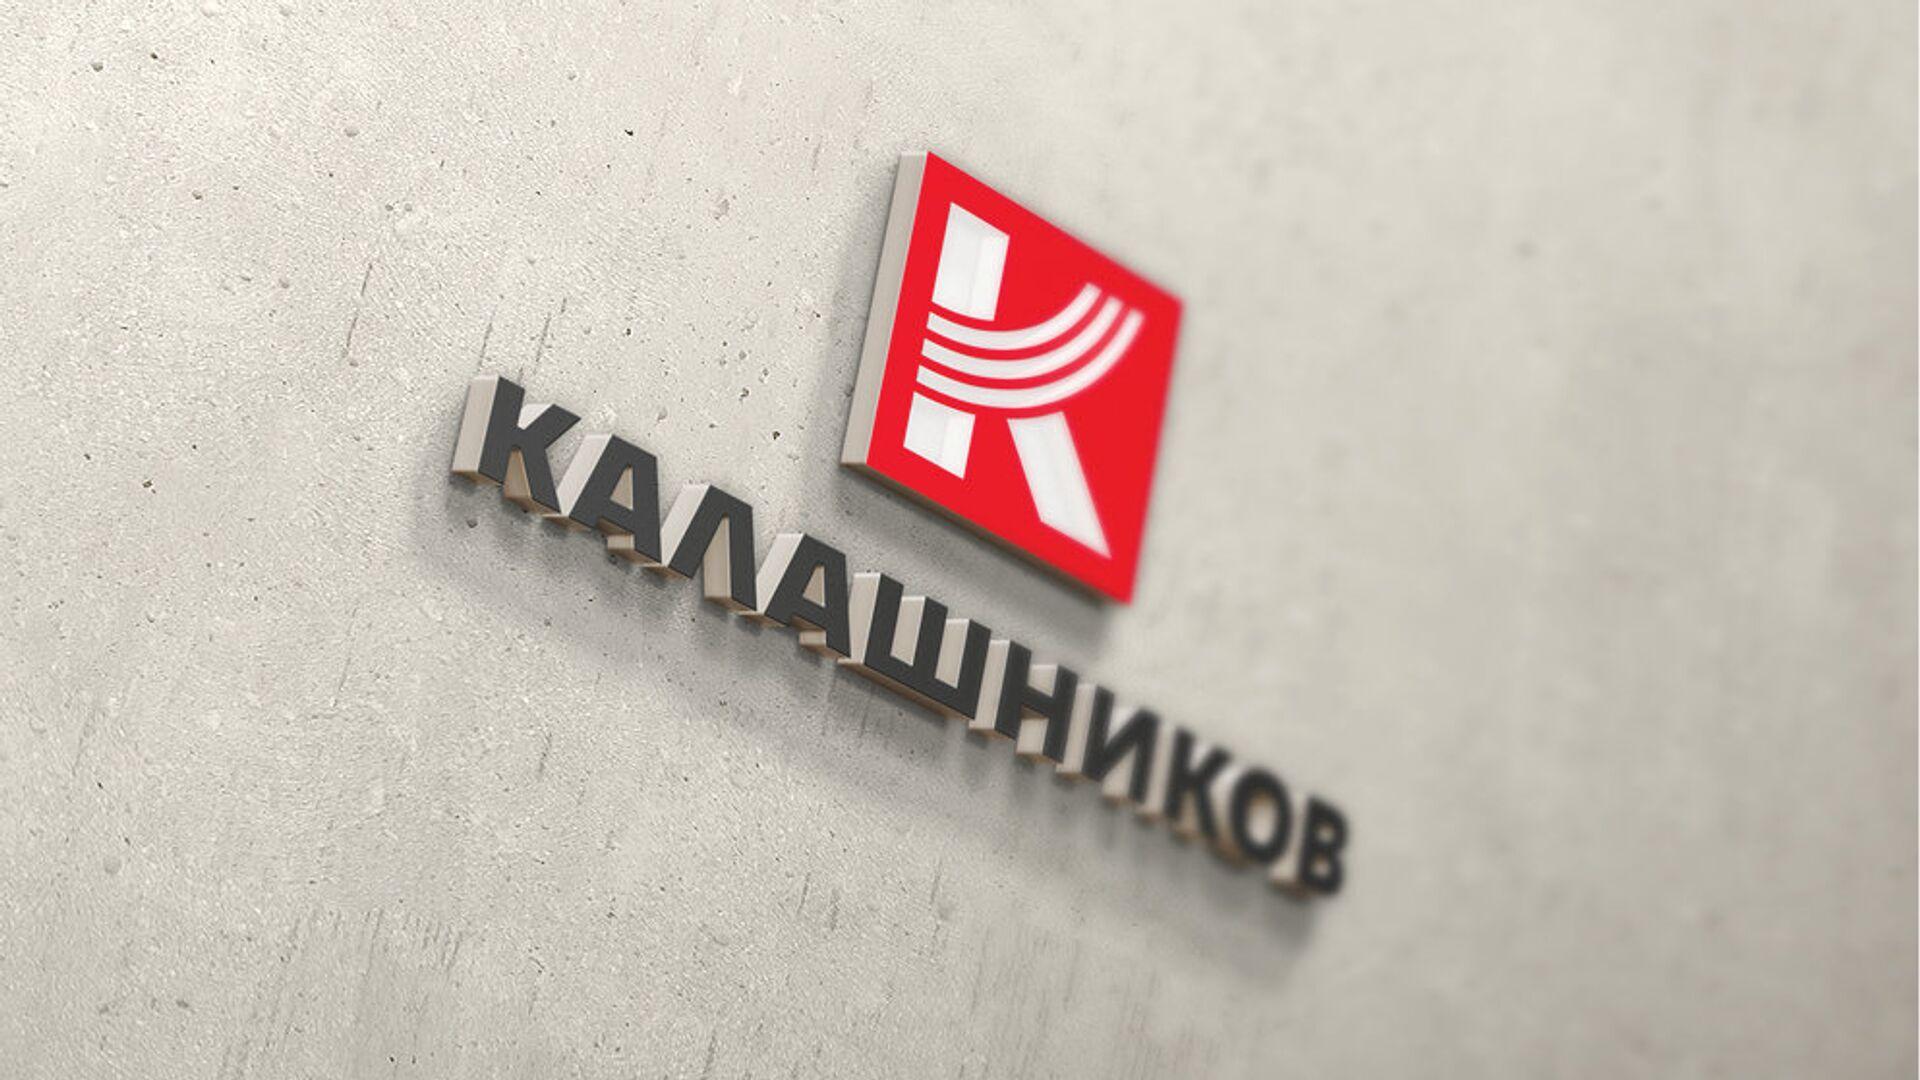 Логотип концерна Калашников  - РИА Новости, 1920, 22.08.2021